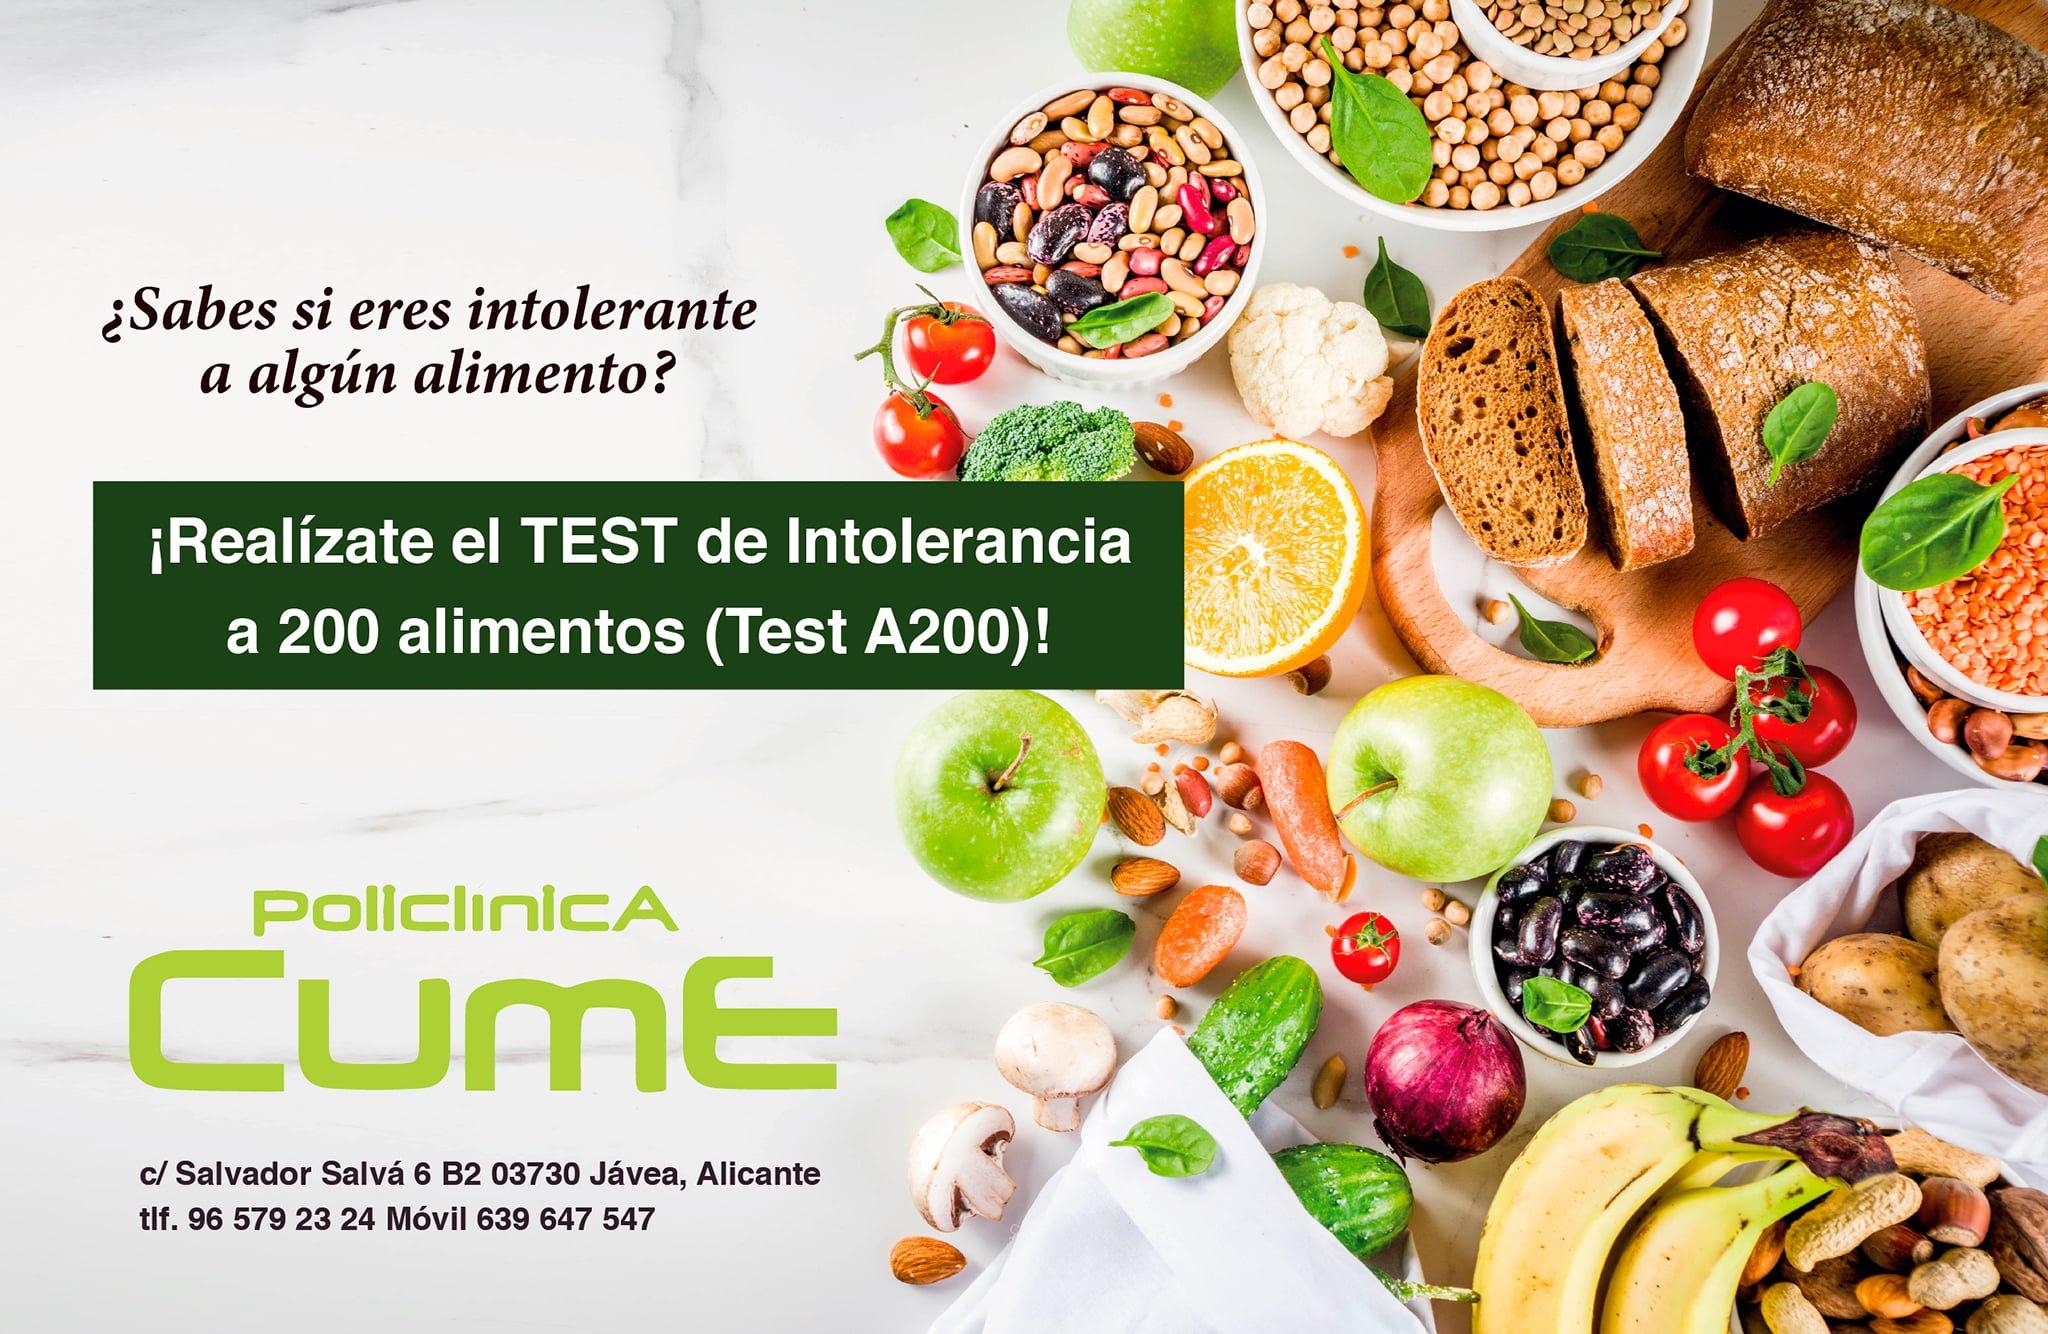 Food Intolerance Test - Cume Polyclinic